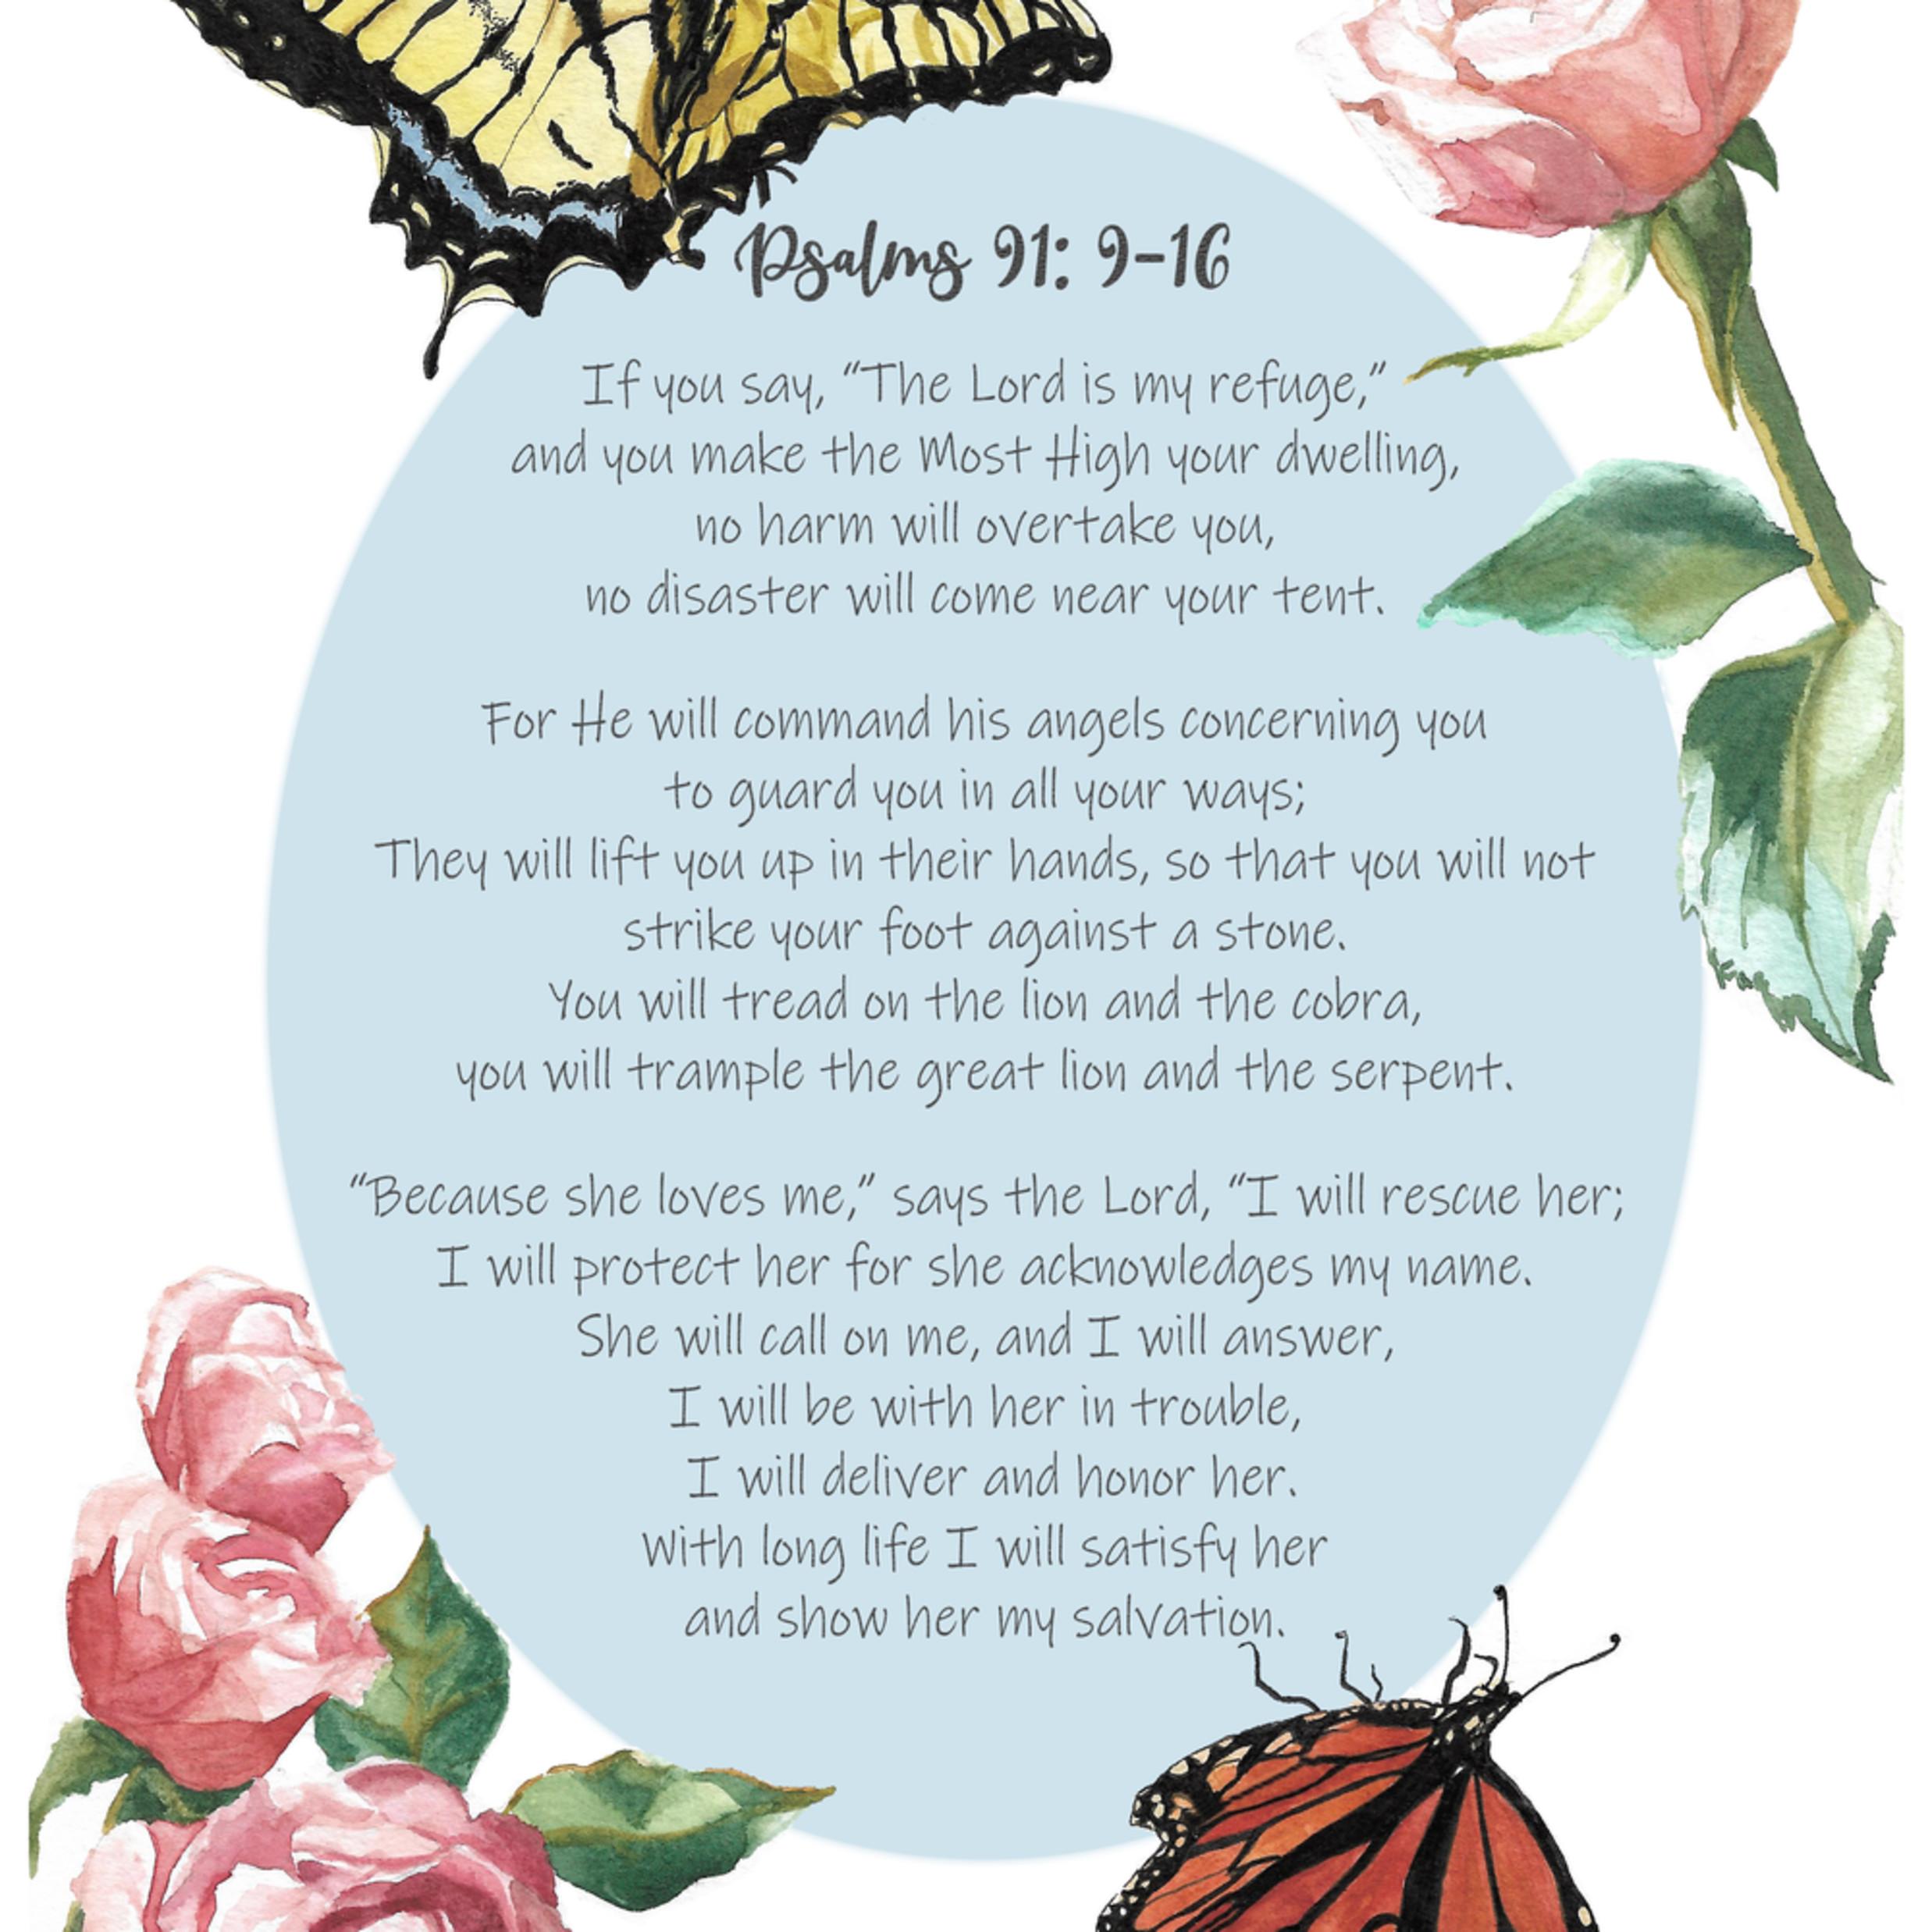 Psalms91 mothersday brittanyselfe 8x10watercolor 2020 ecye7k